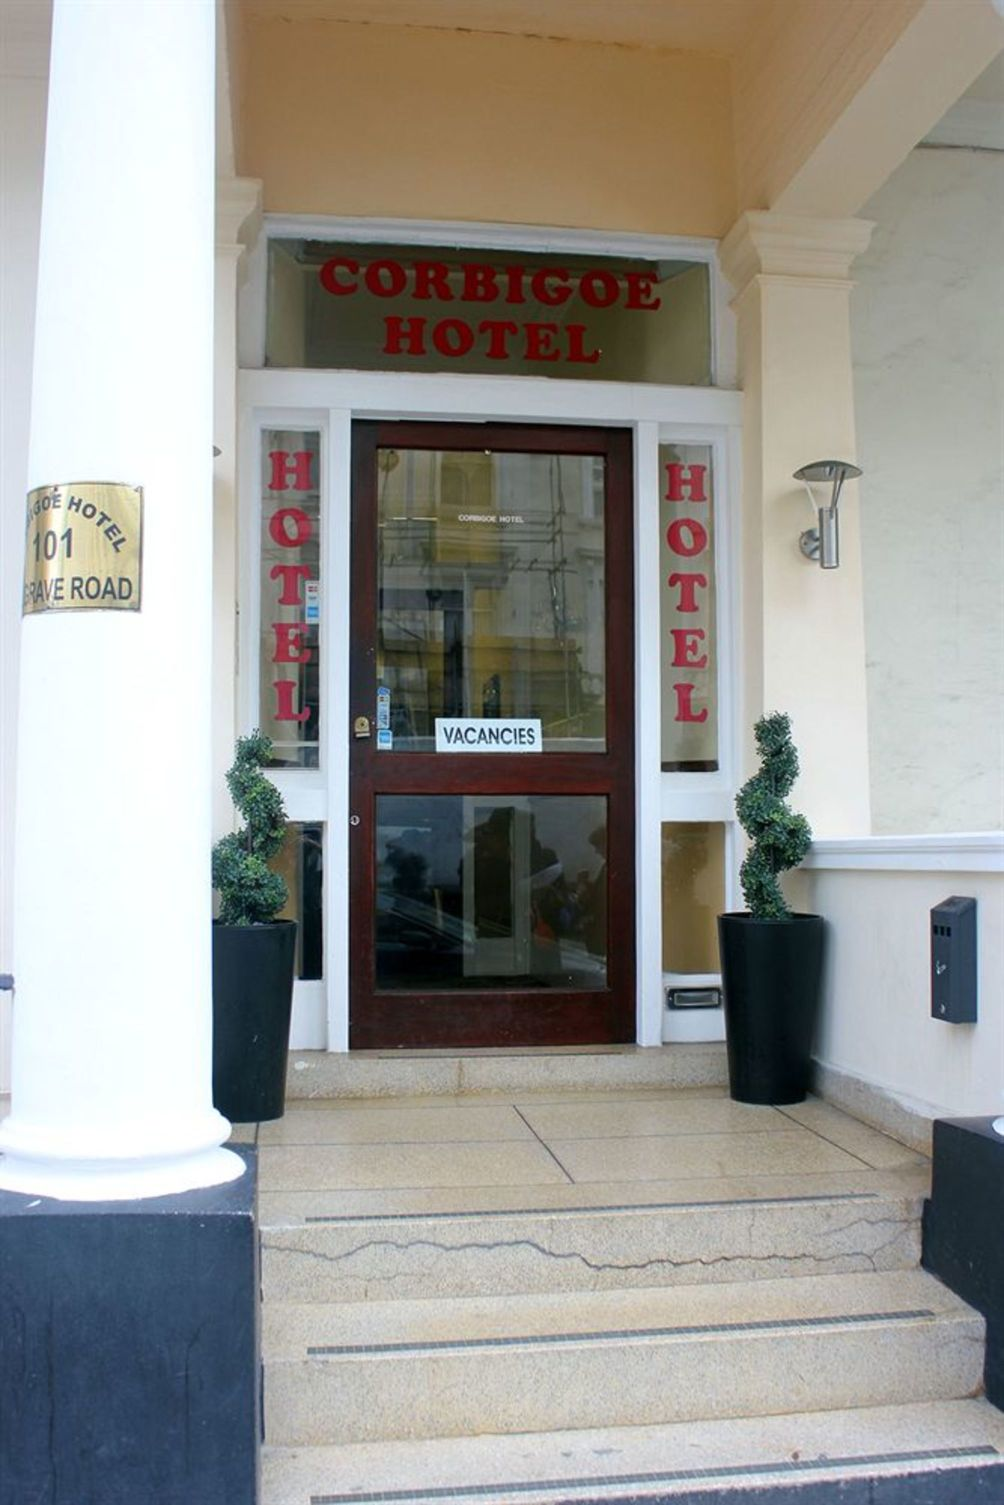 Hotel Corbigoe Hotel, Victoria thumb-4